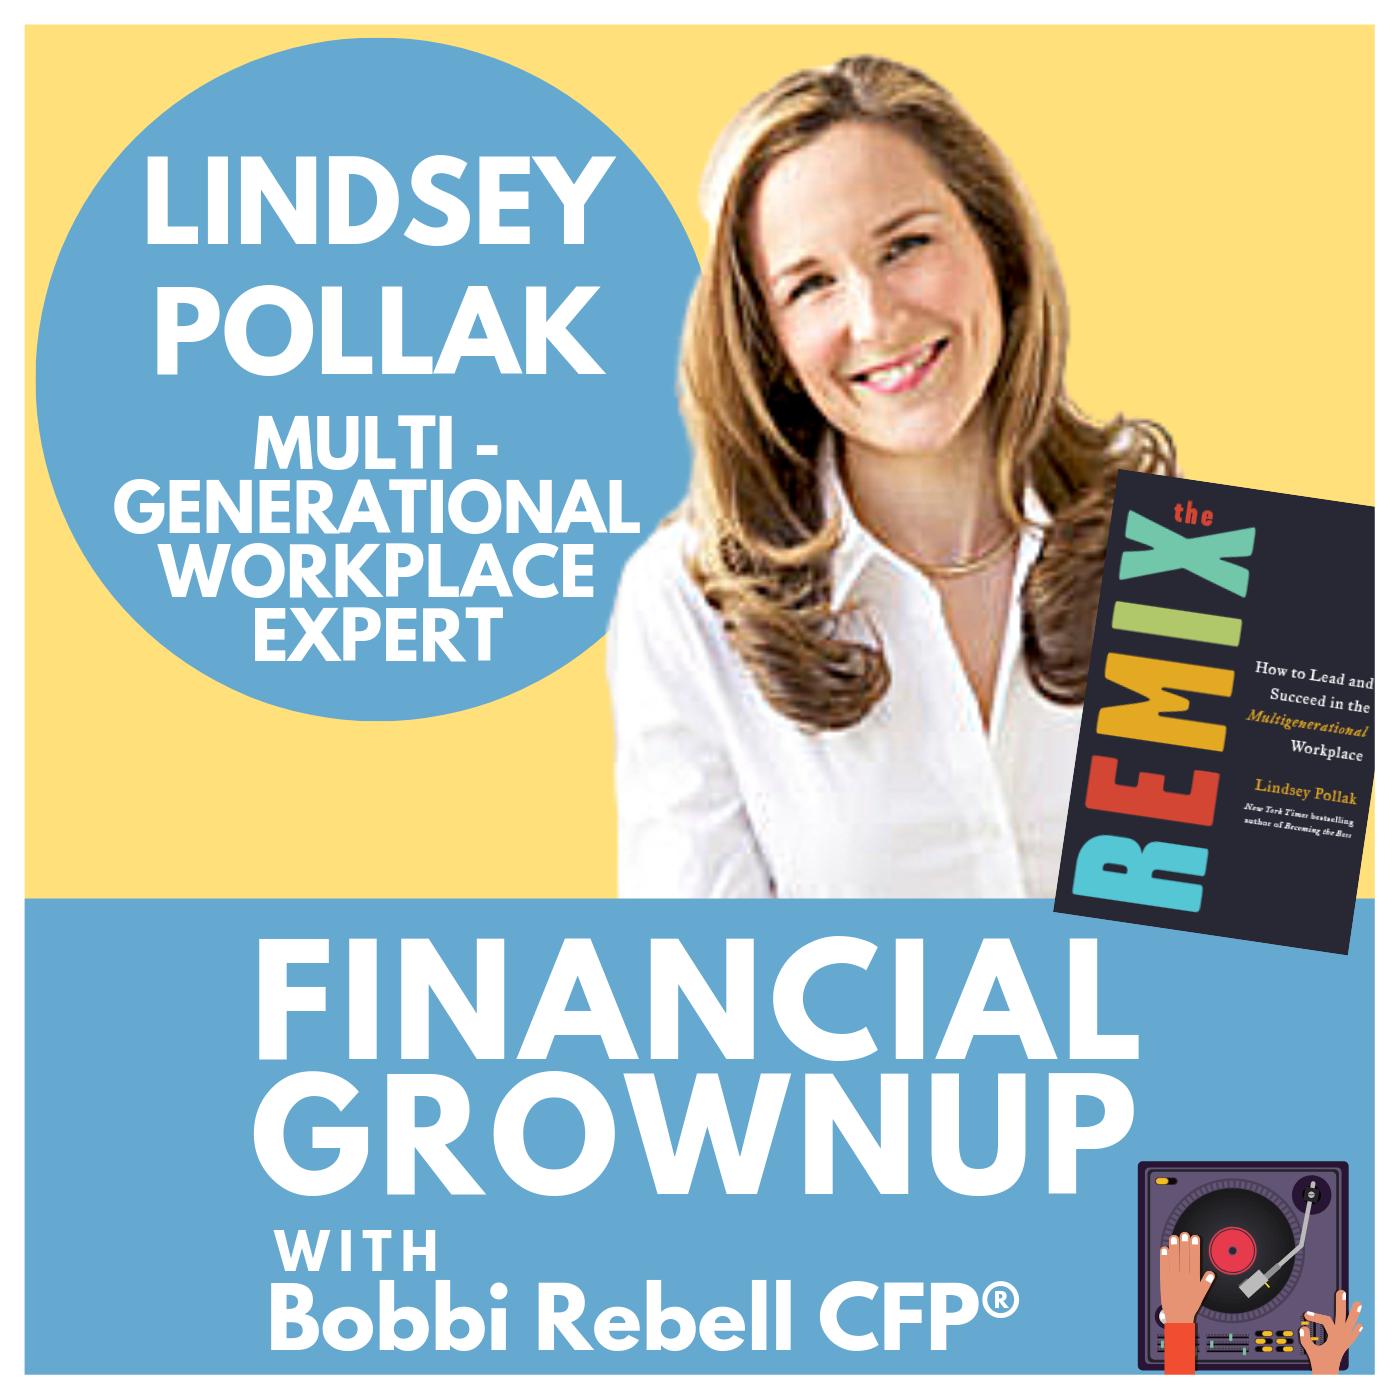 Lindsey Pollak Instagram